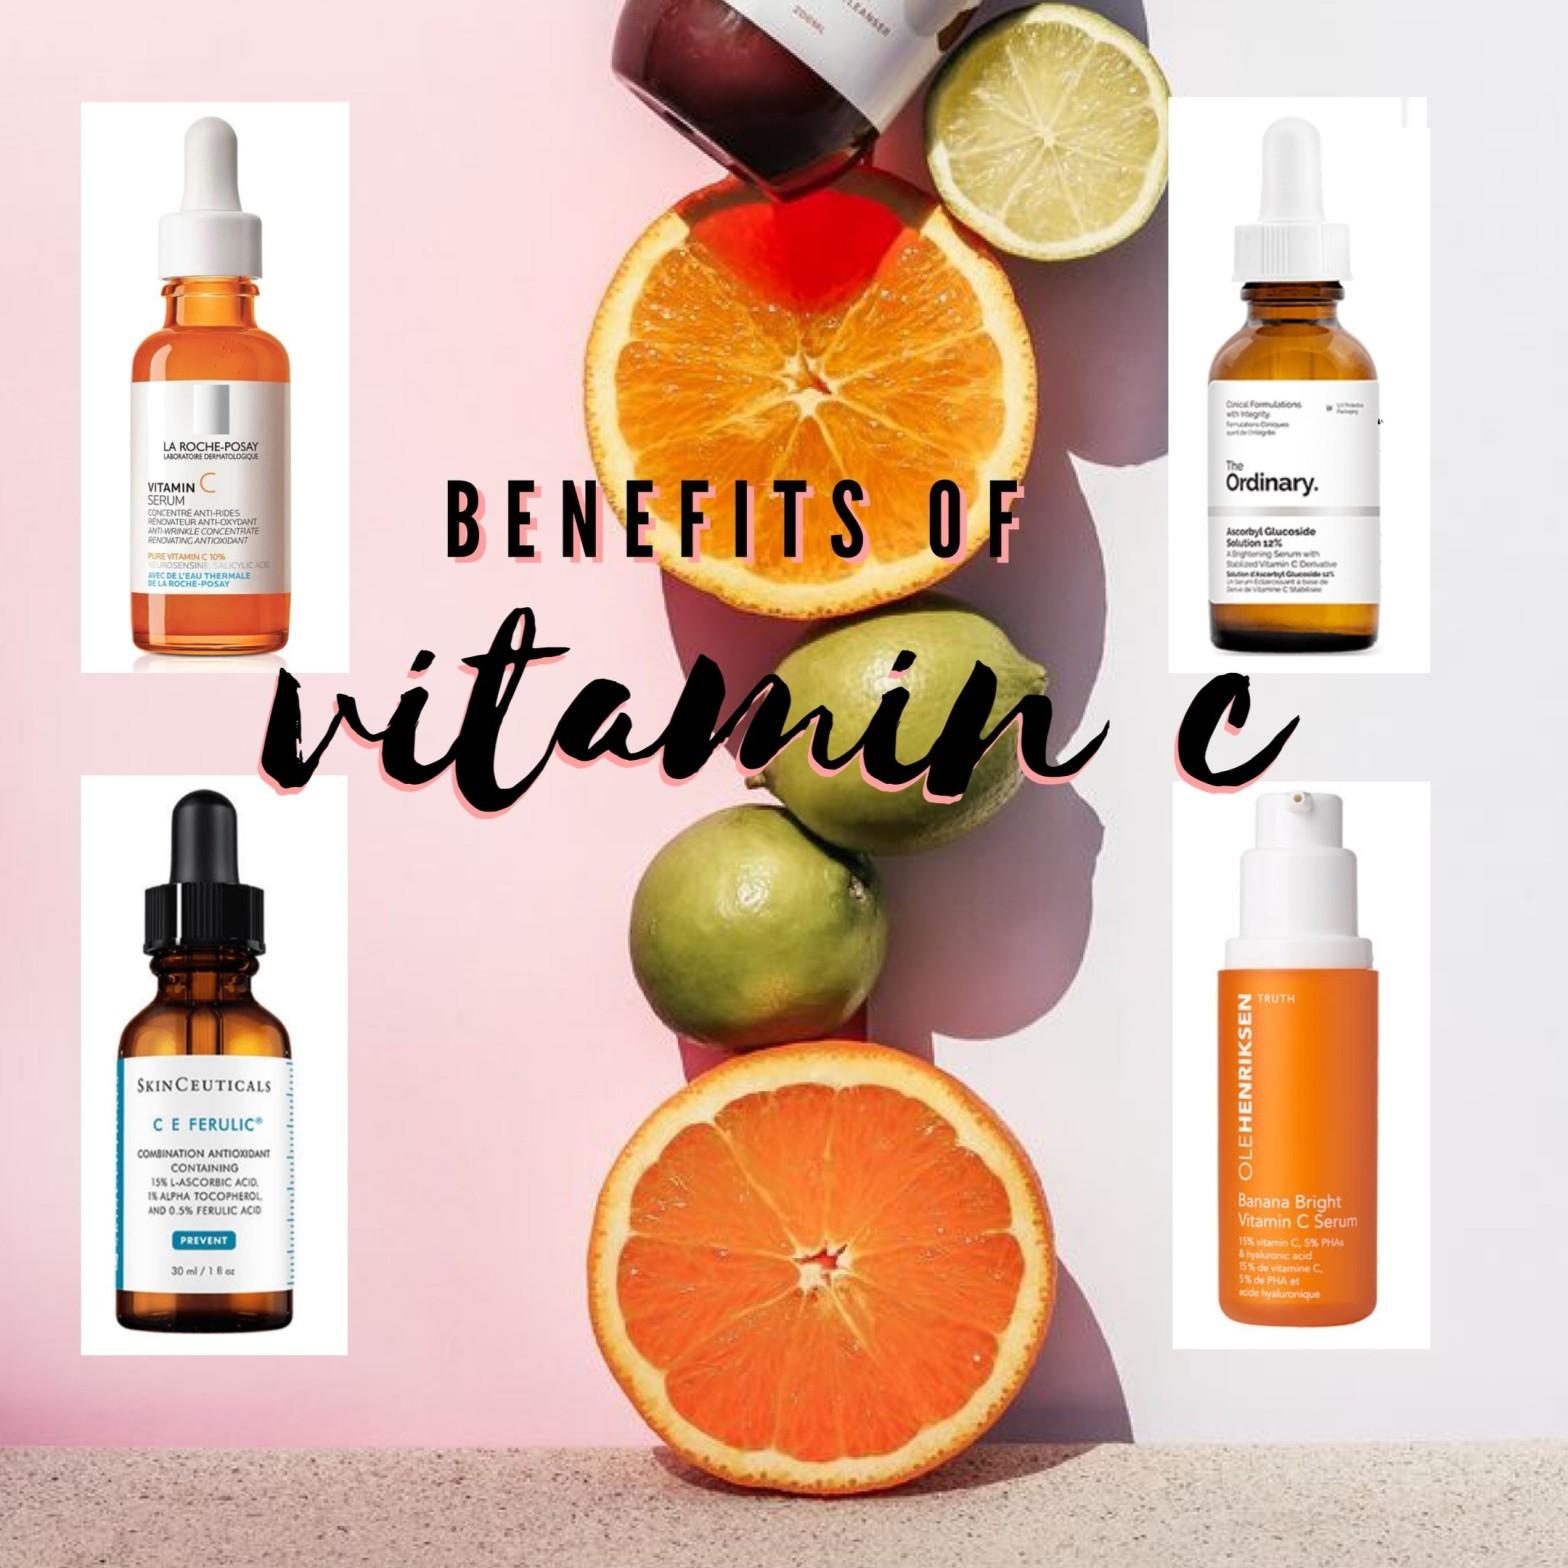 the ordinary, skinceuticals, vitamin c